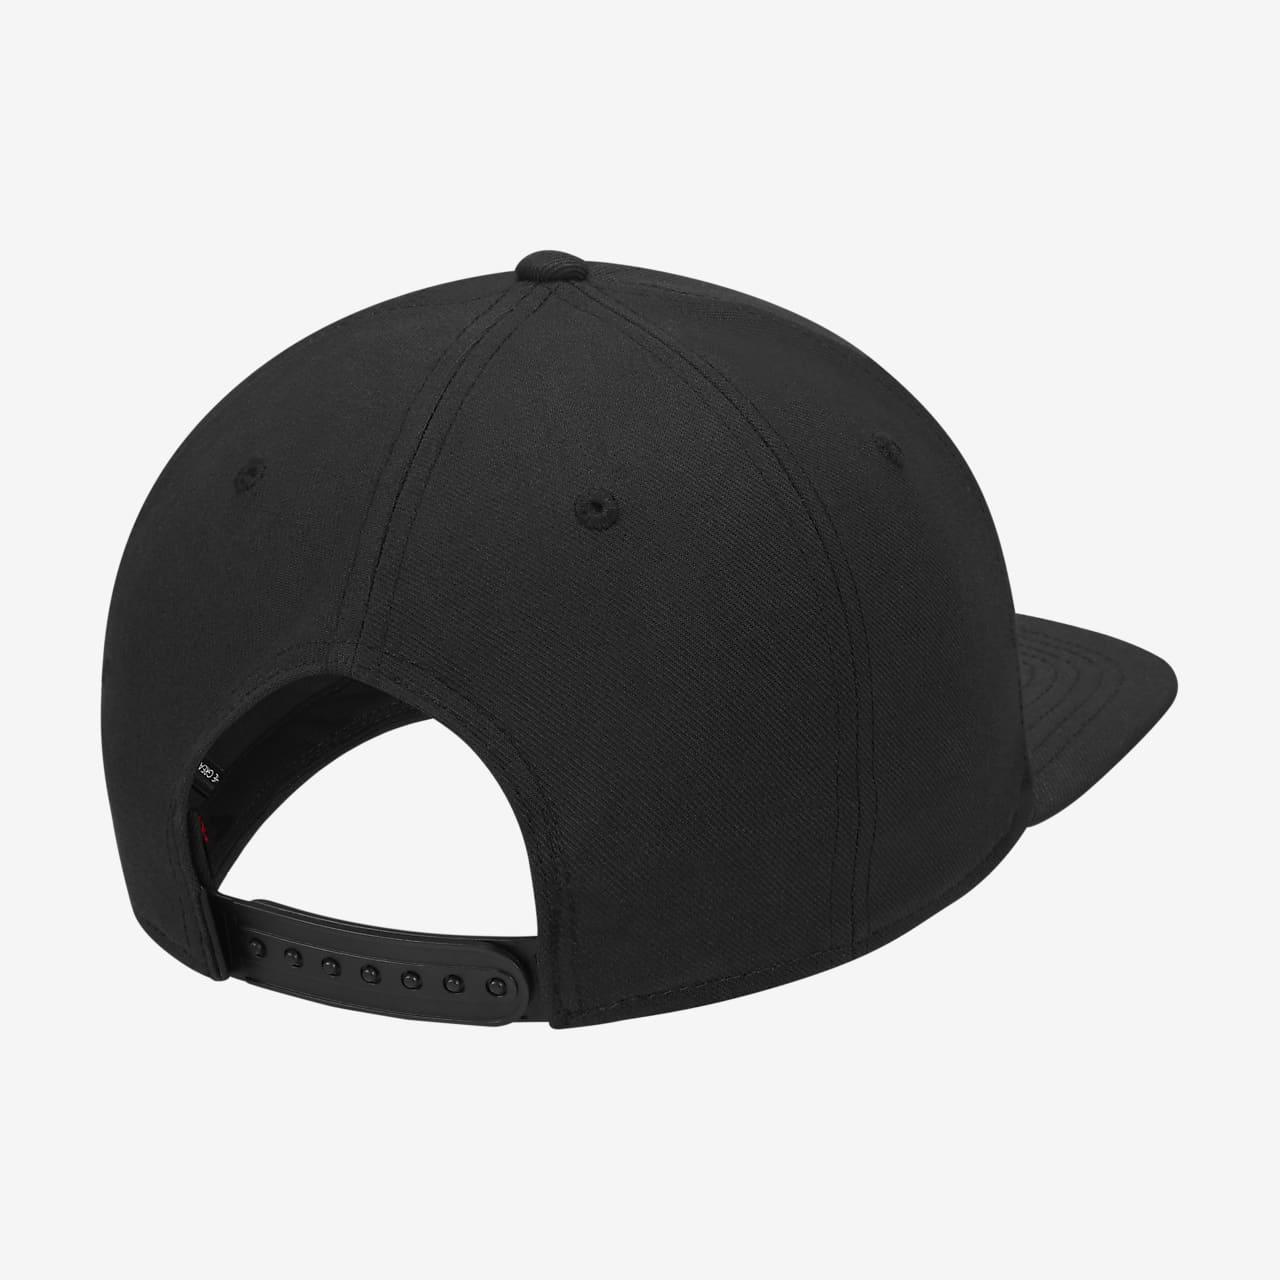 d7f1e8cdc Jordan Pro Jumpman Snapback Hat. Nike.com AE